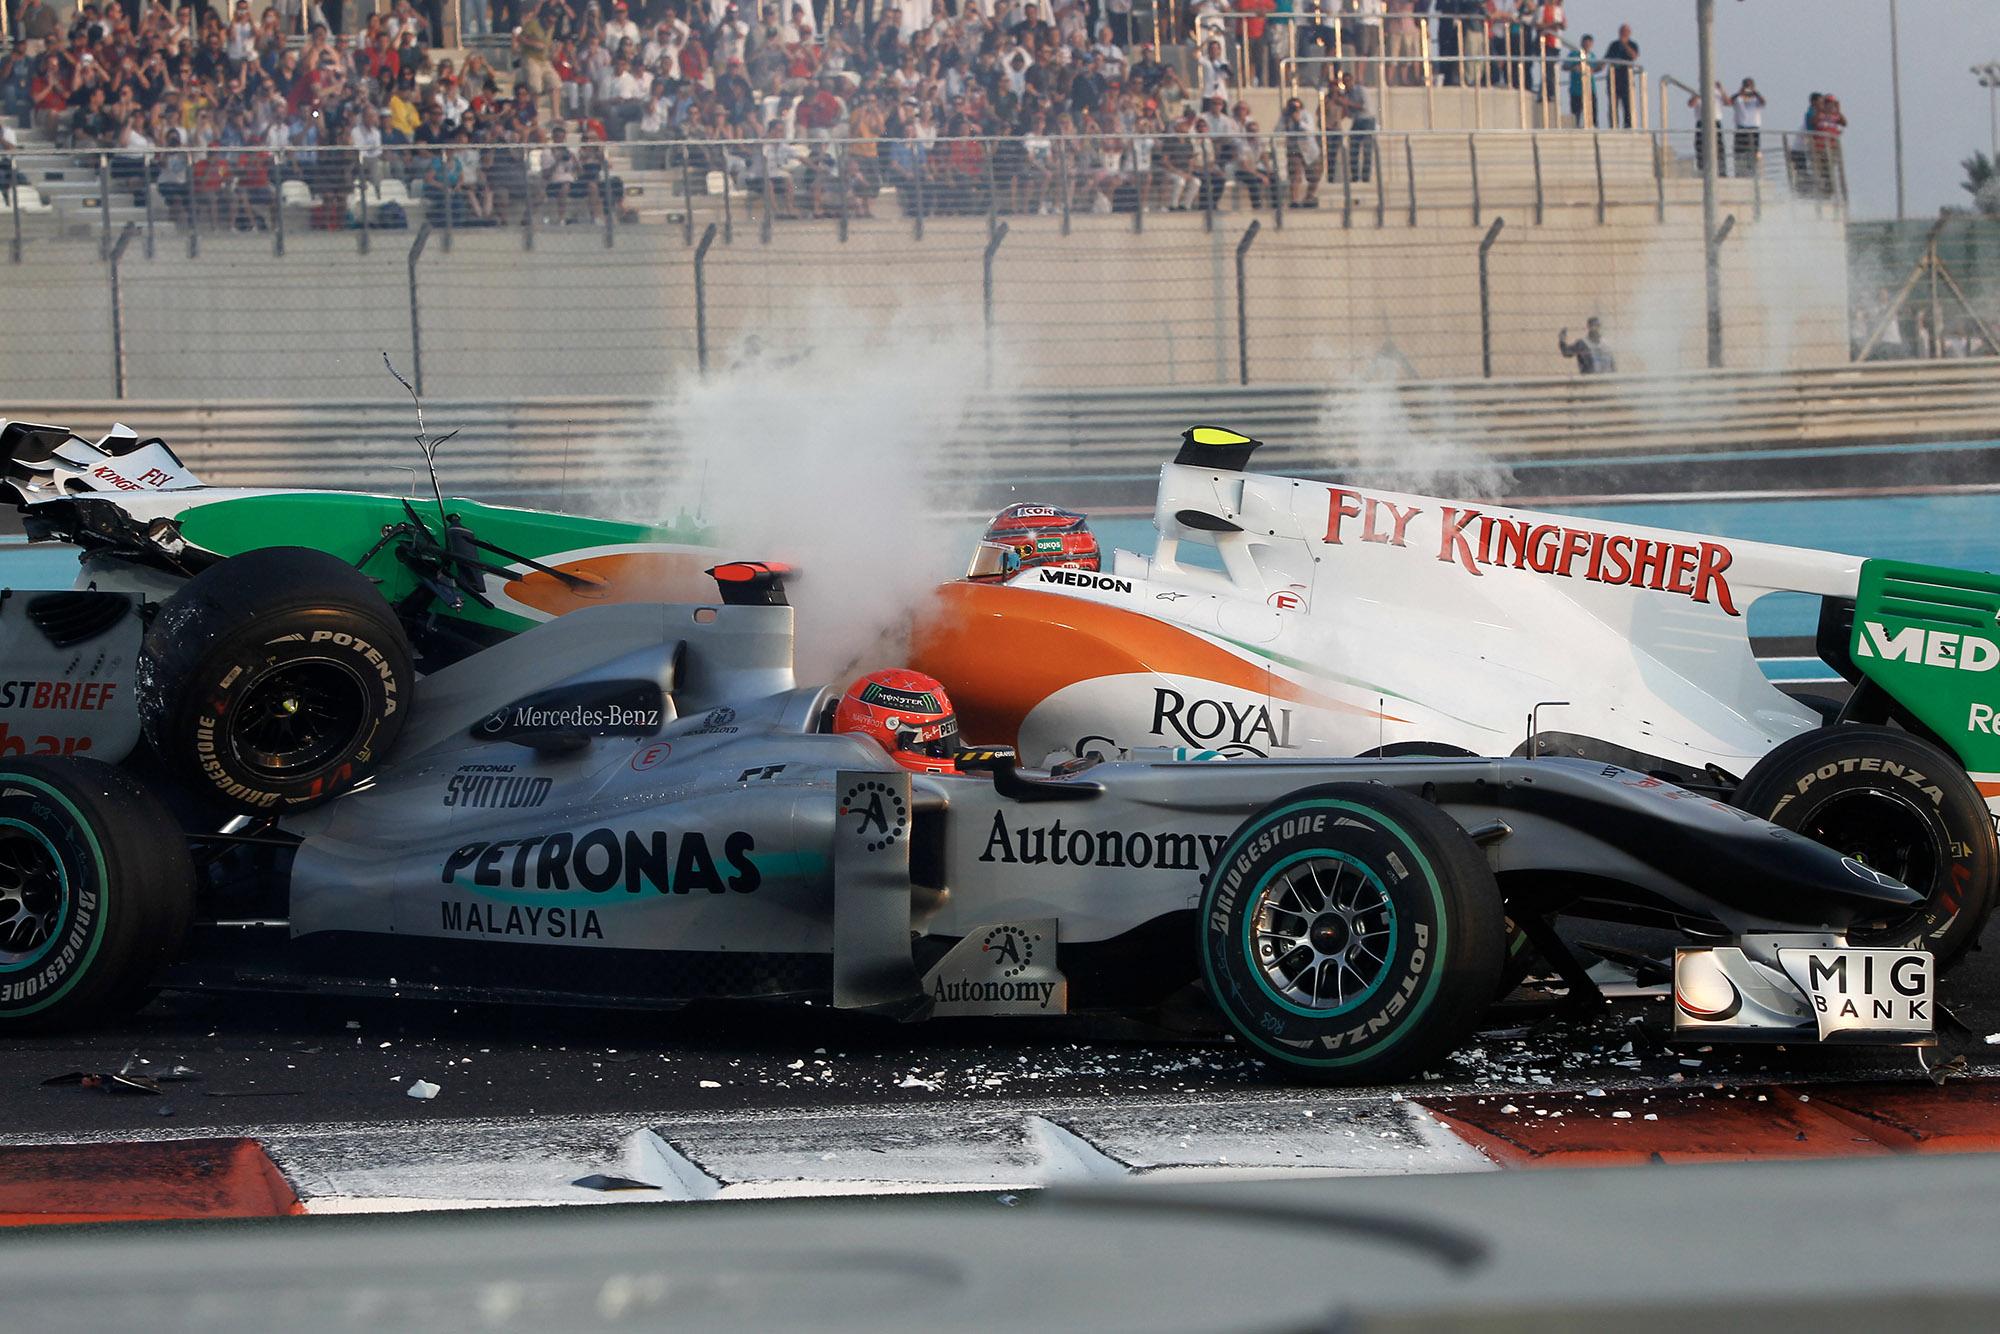 Antonio Luizzi crashes into Michael Schumacher at the start of the 2010 Abu Dhabi Grand Prix